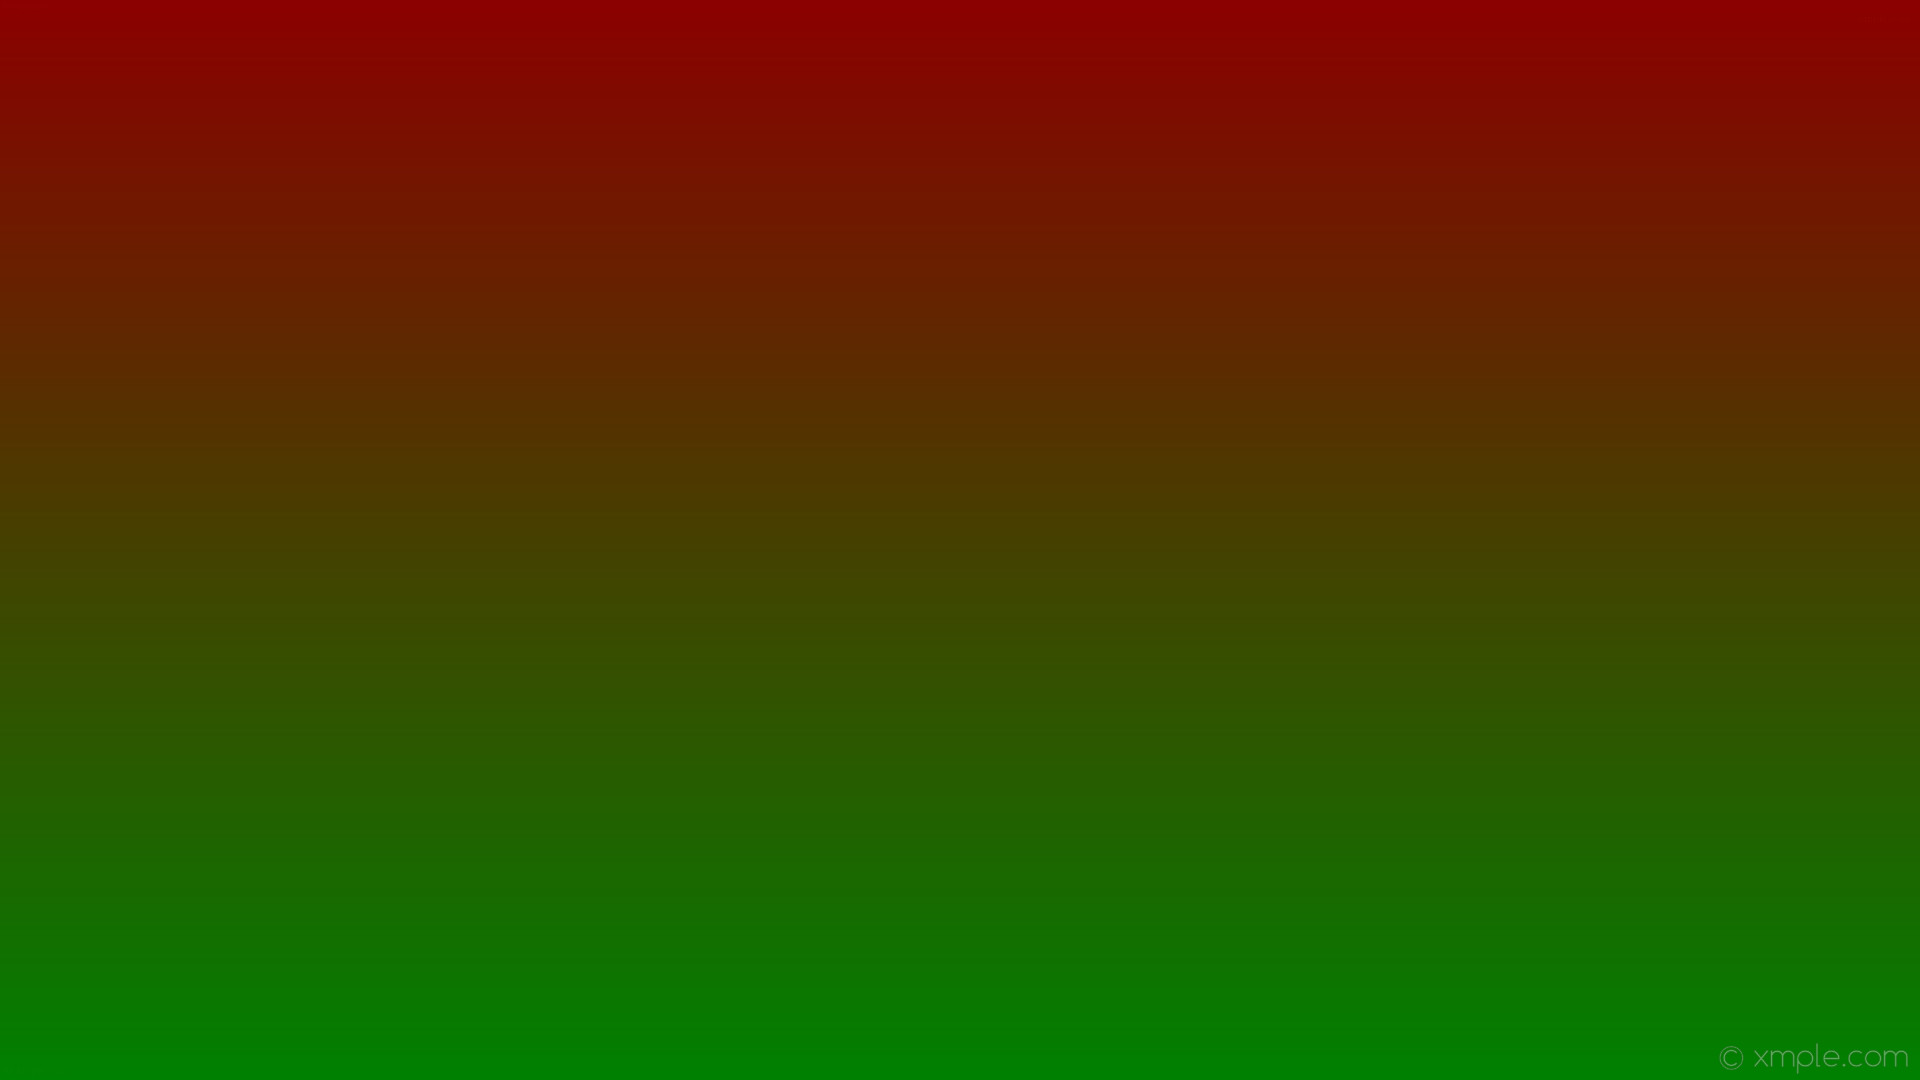 wallpaper gradient red linear green dark red #8b0000 #008000 90°